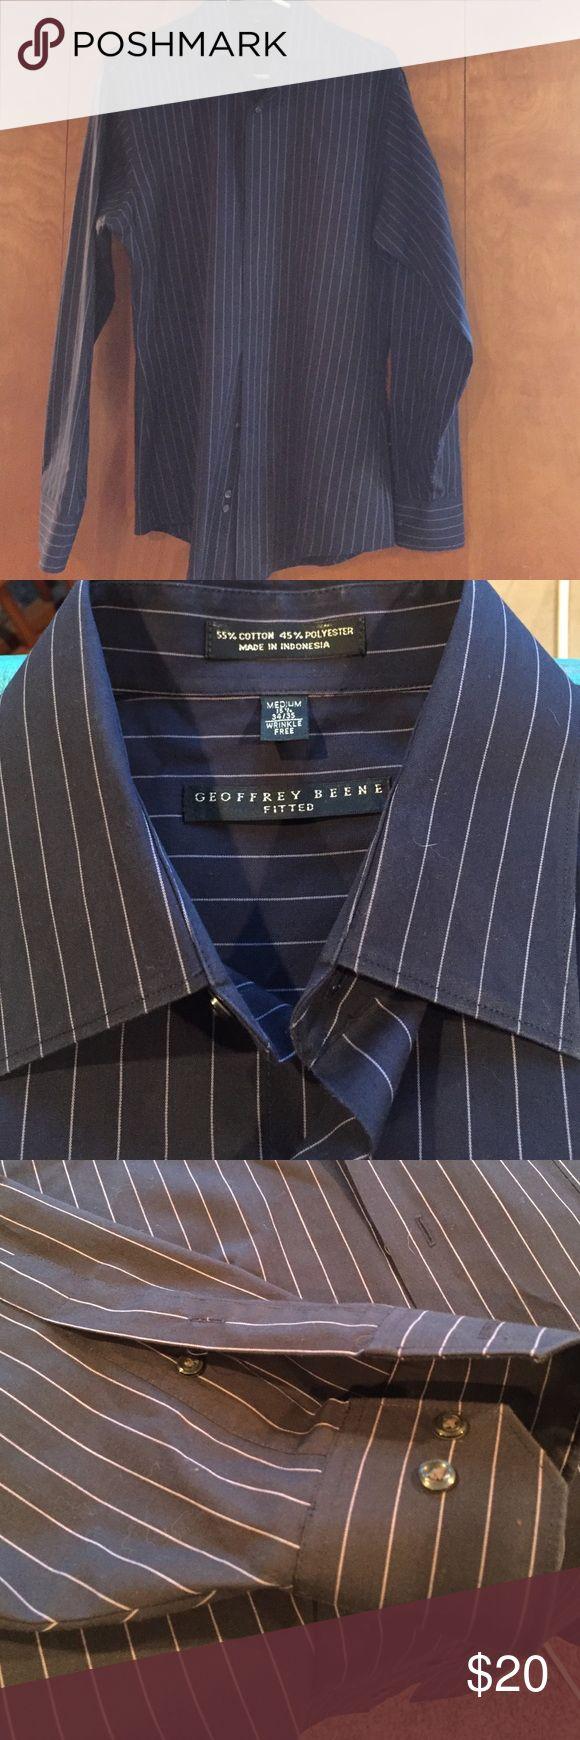 Geoffrey Beene dress shirt Geoffrey Beene dress shirt, navy blue with pink pin stripe like new condition sz M 15 1/2 34/35 Geoffrey Beene Shirts Dress Shirts